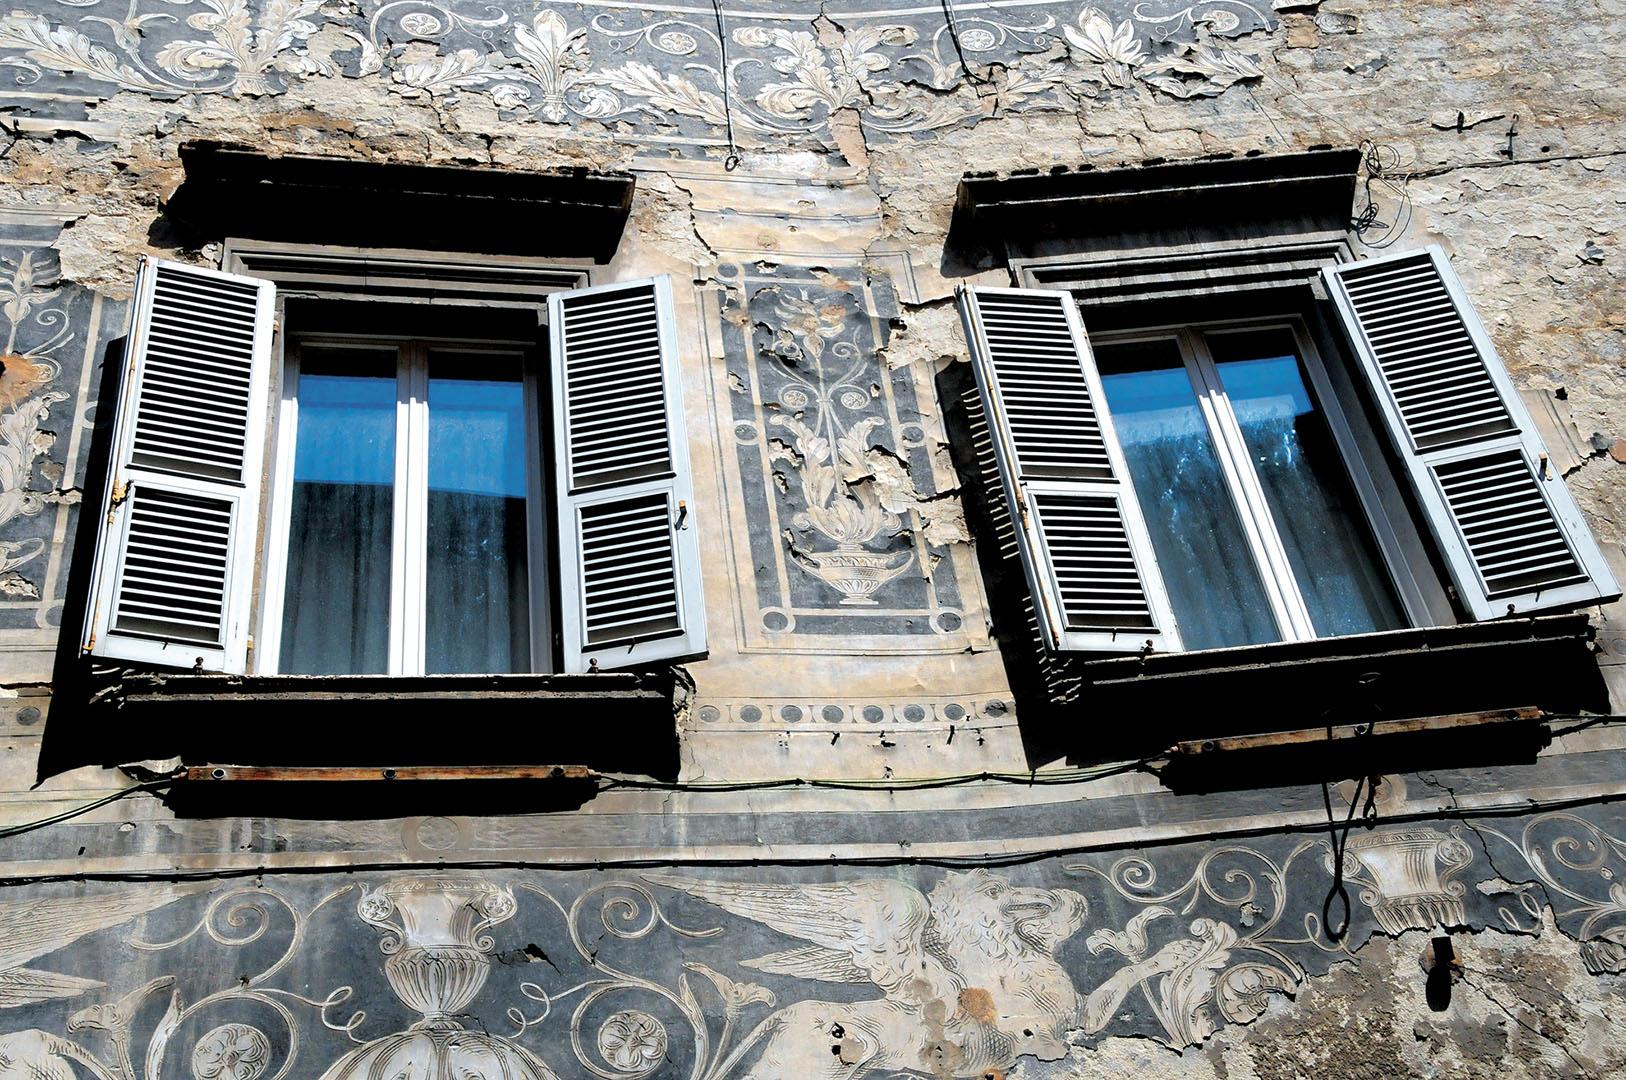 Ascoli_Piceno_073_I08-5.73